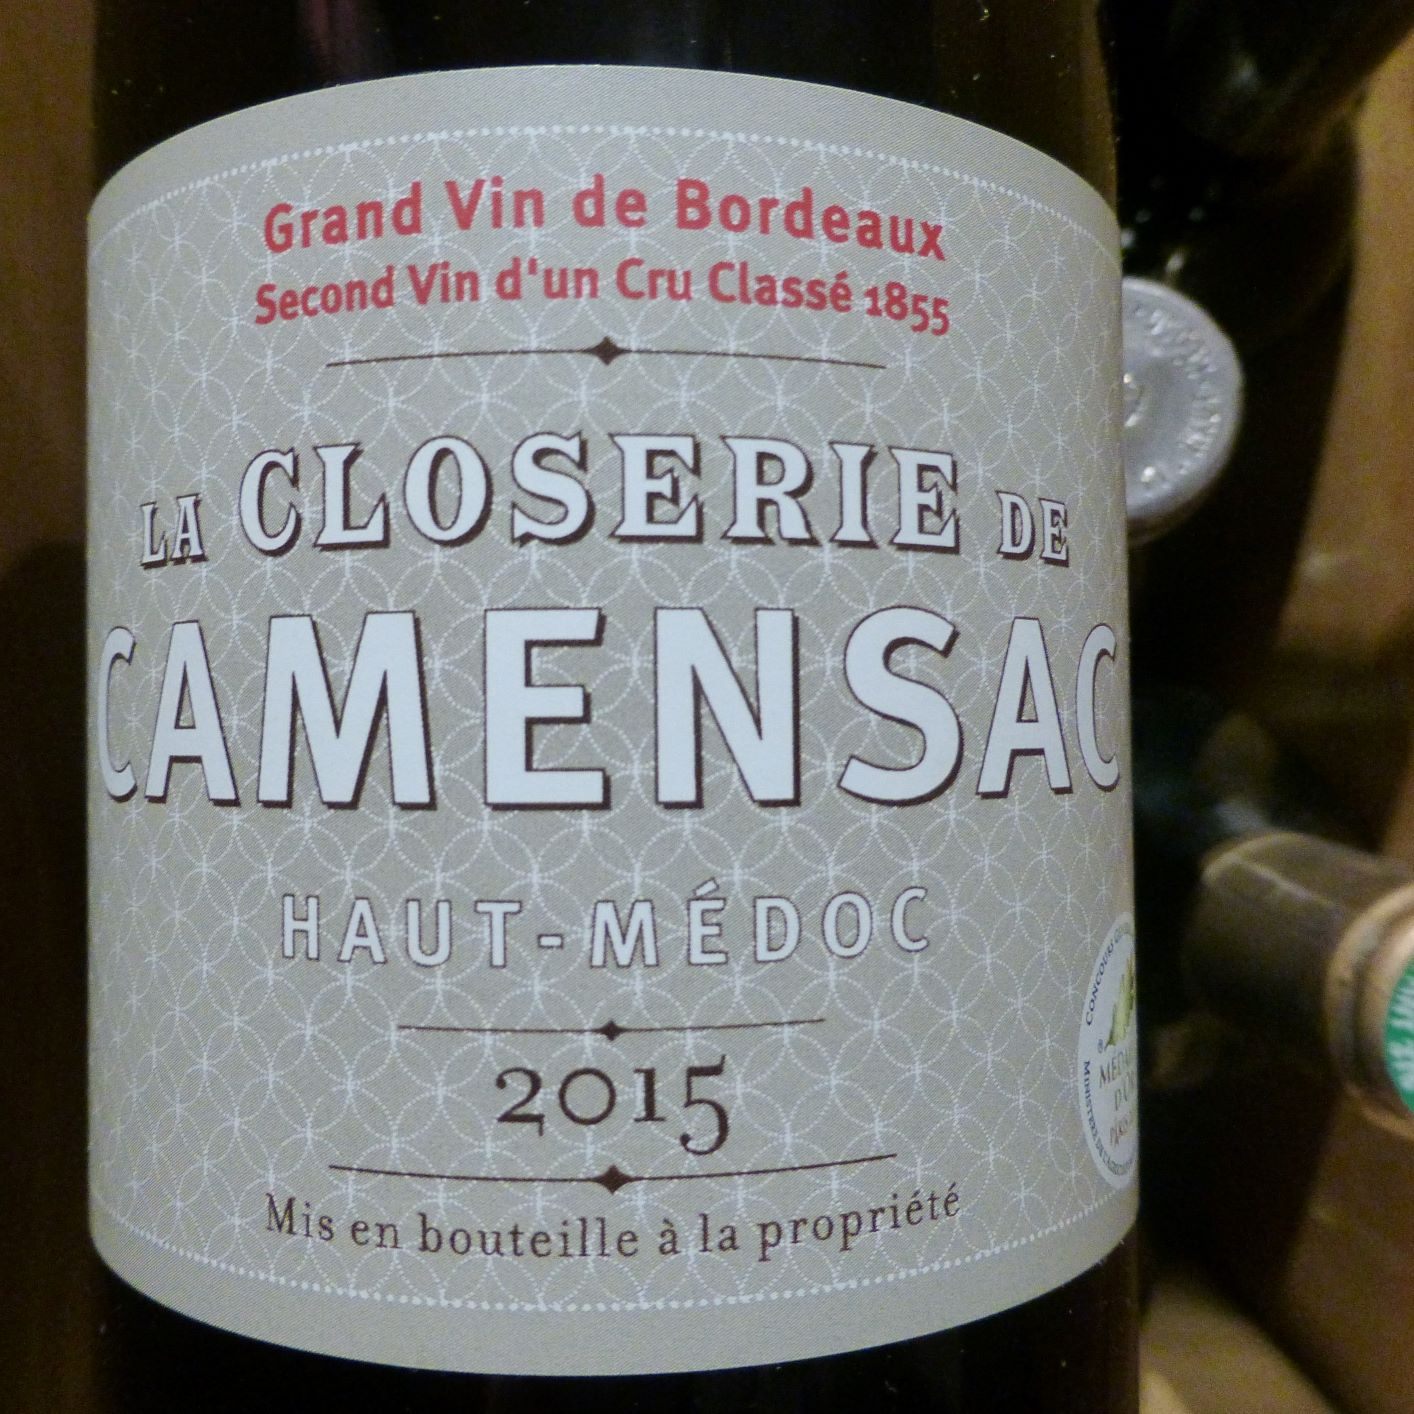 2015 La Closerie de Camensac, Haut-Médoc